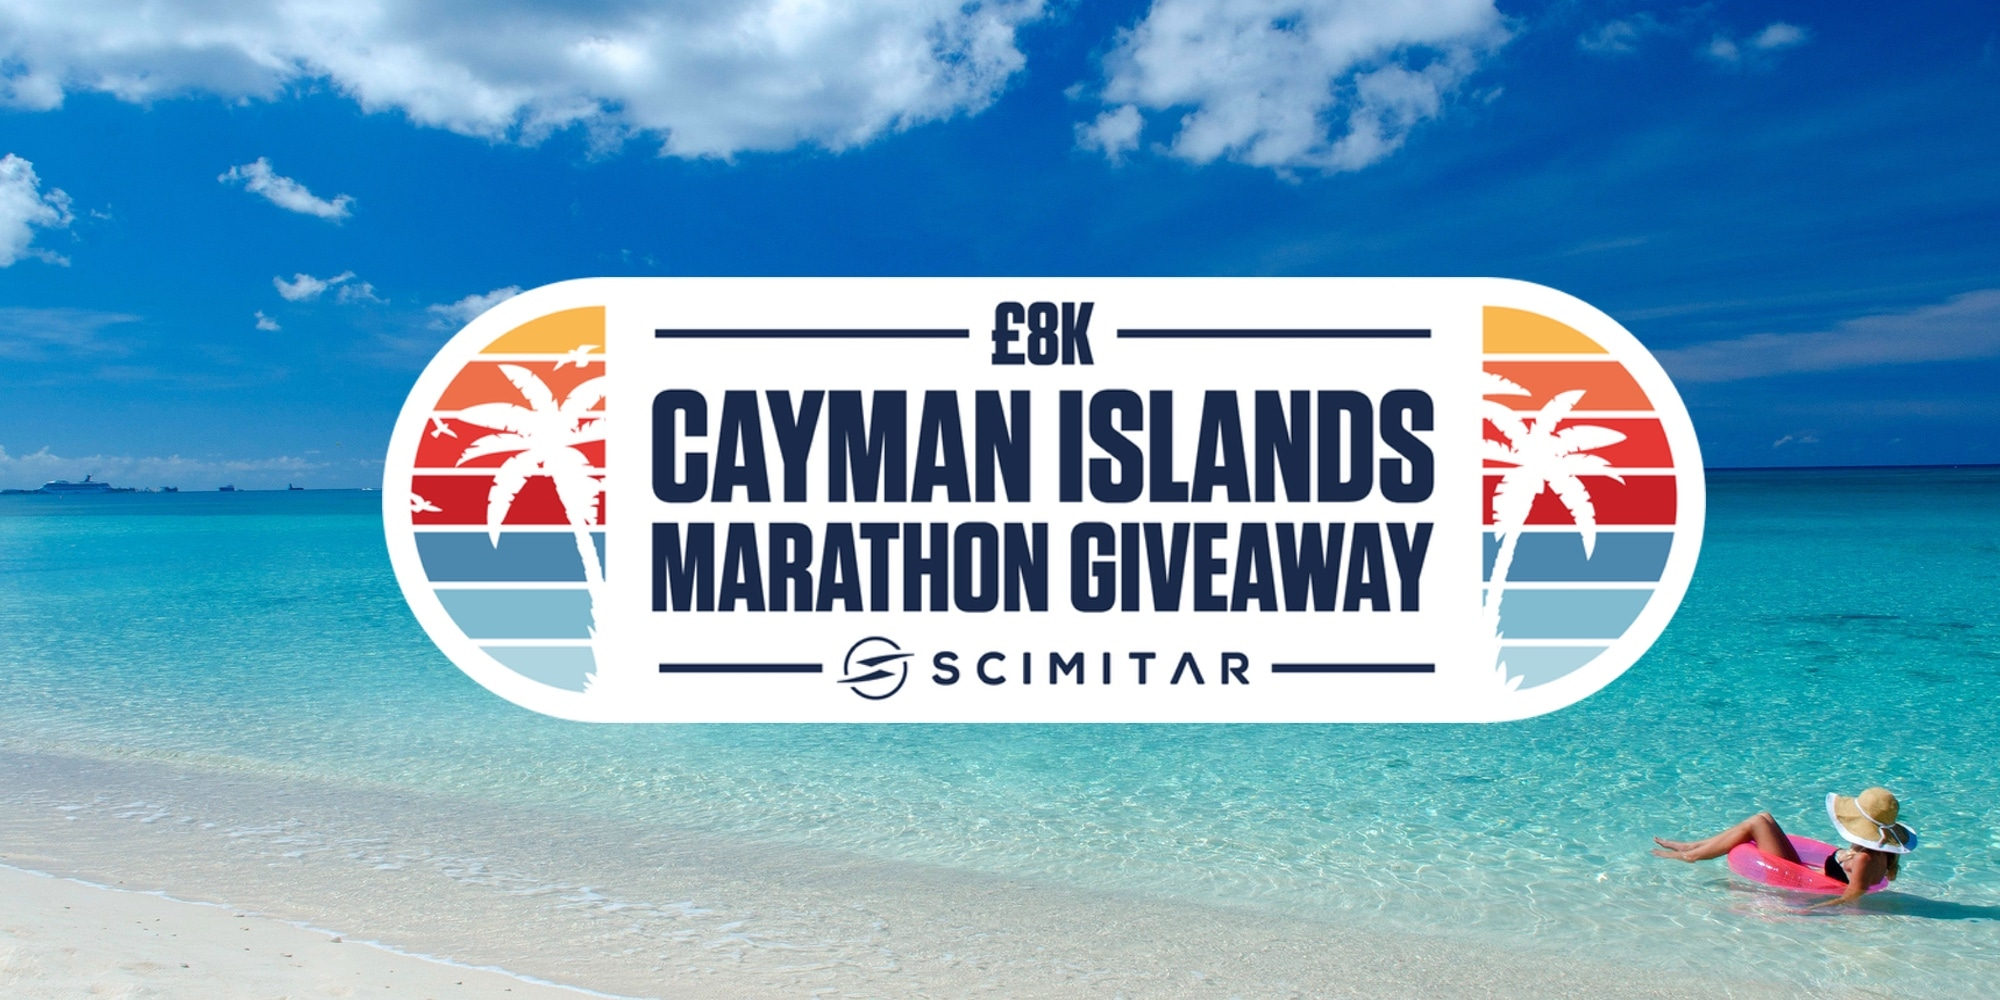 Scimitar x Visit Cayman Islands £8k Marathon Giveaway Giveaway Image